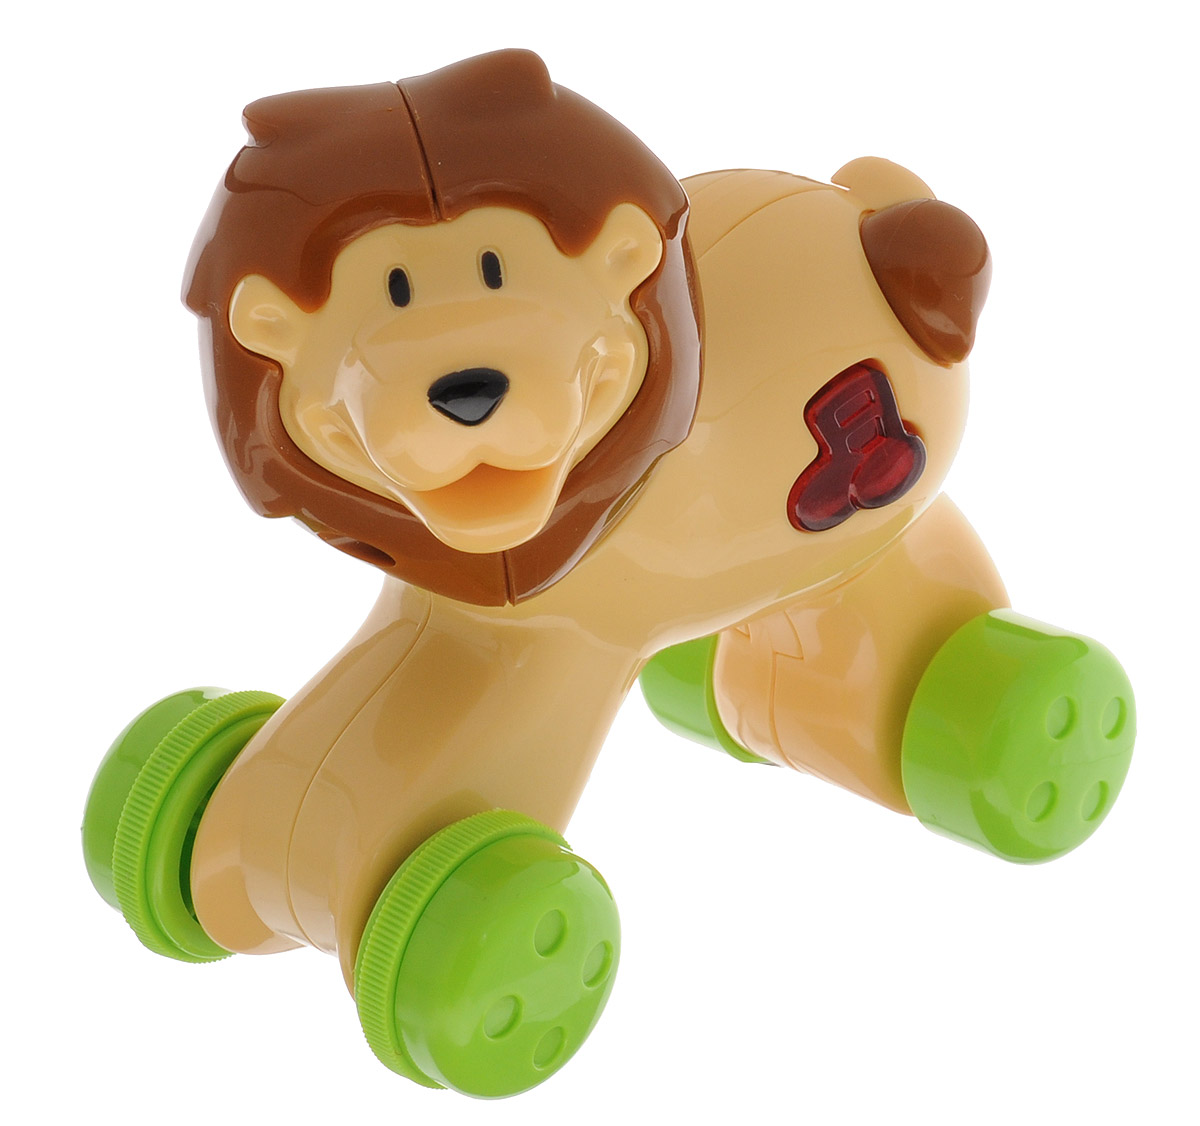 Navystar Музыкальная игрушка-каталка Лев игрушка